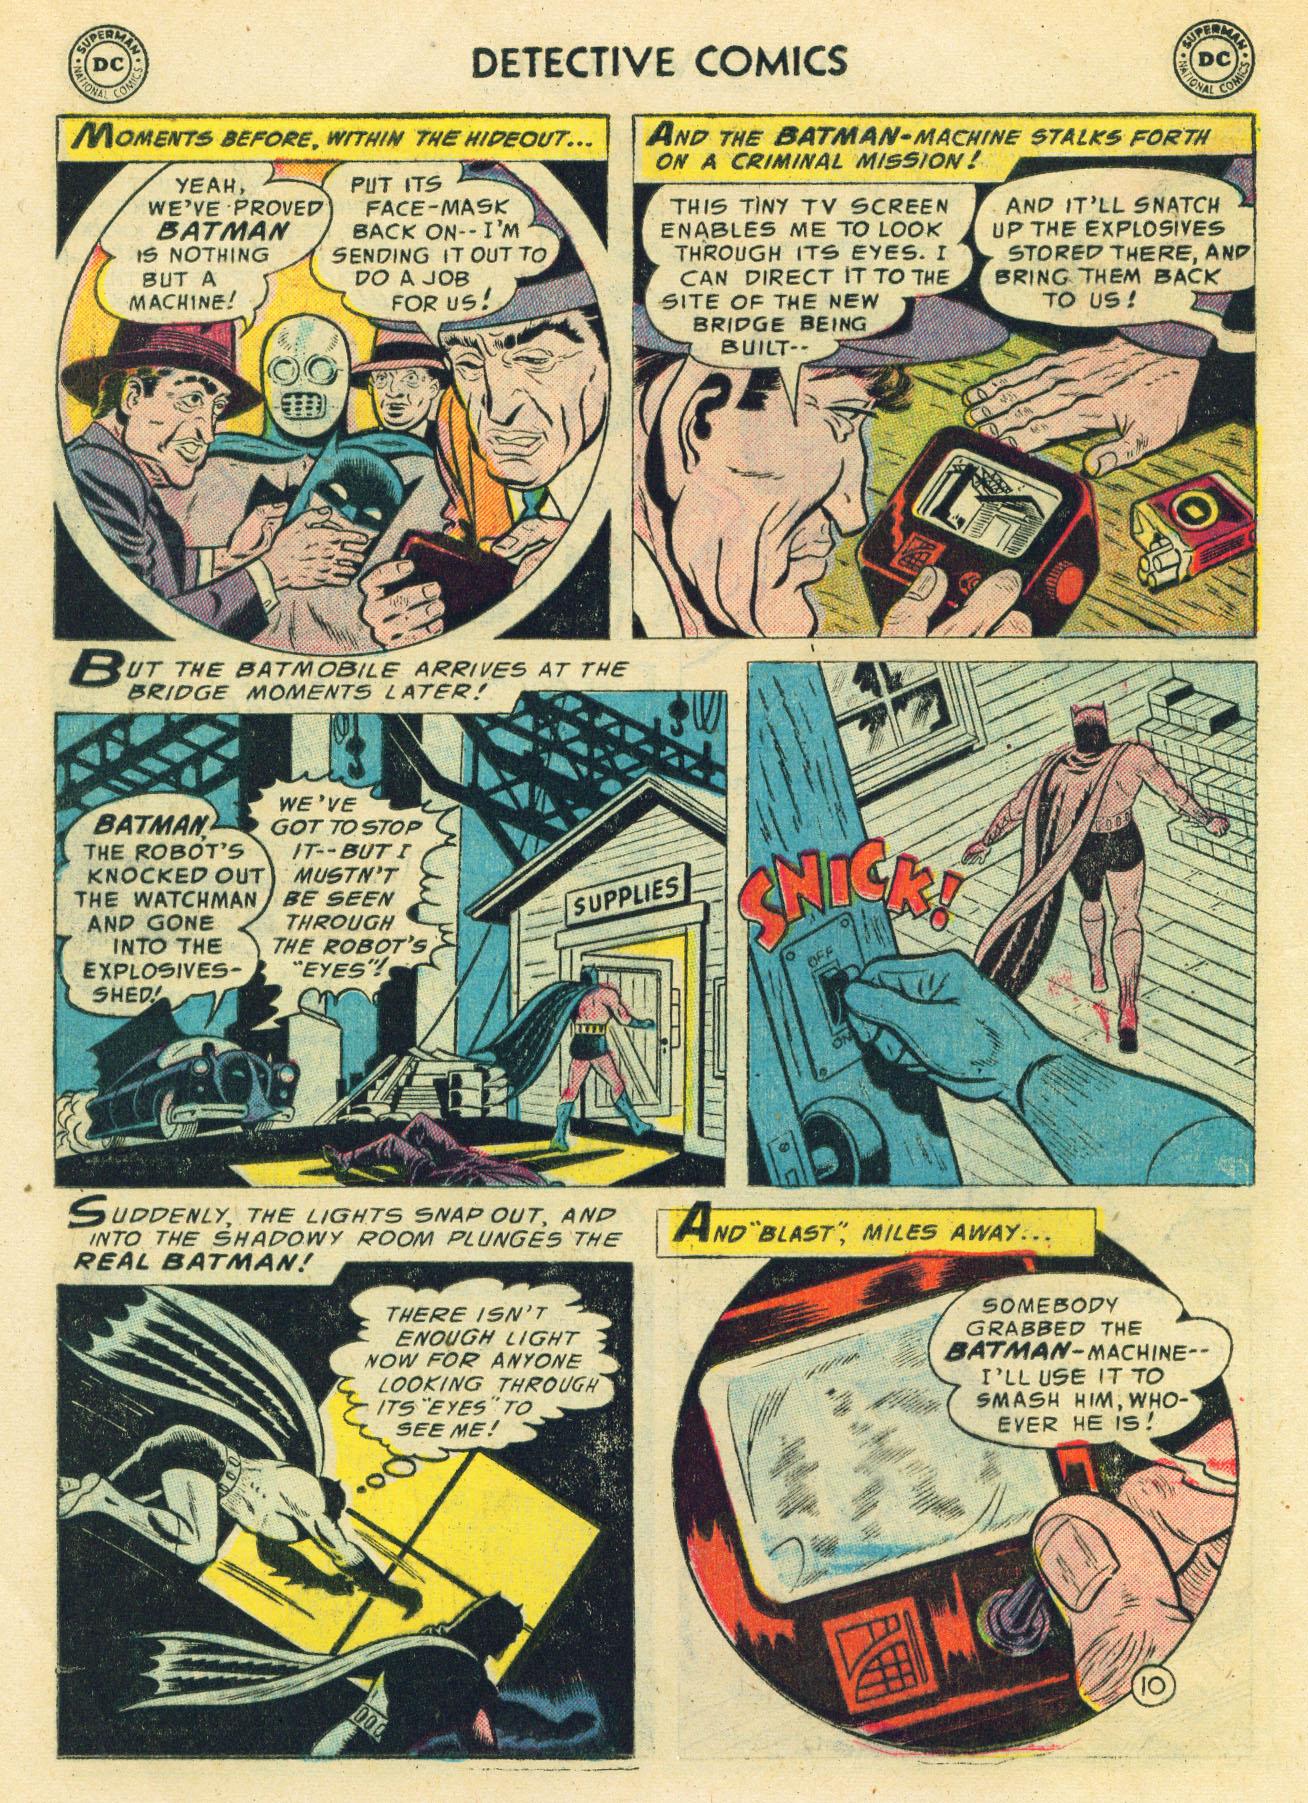 Detective Comics (1937) 224 Page 11